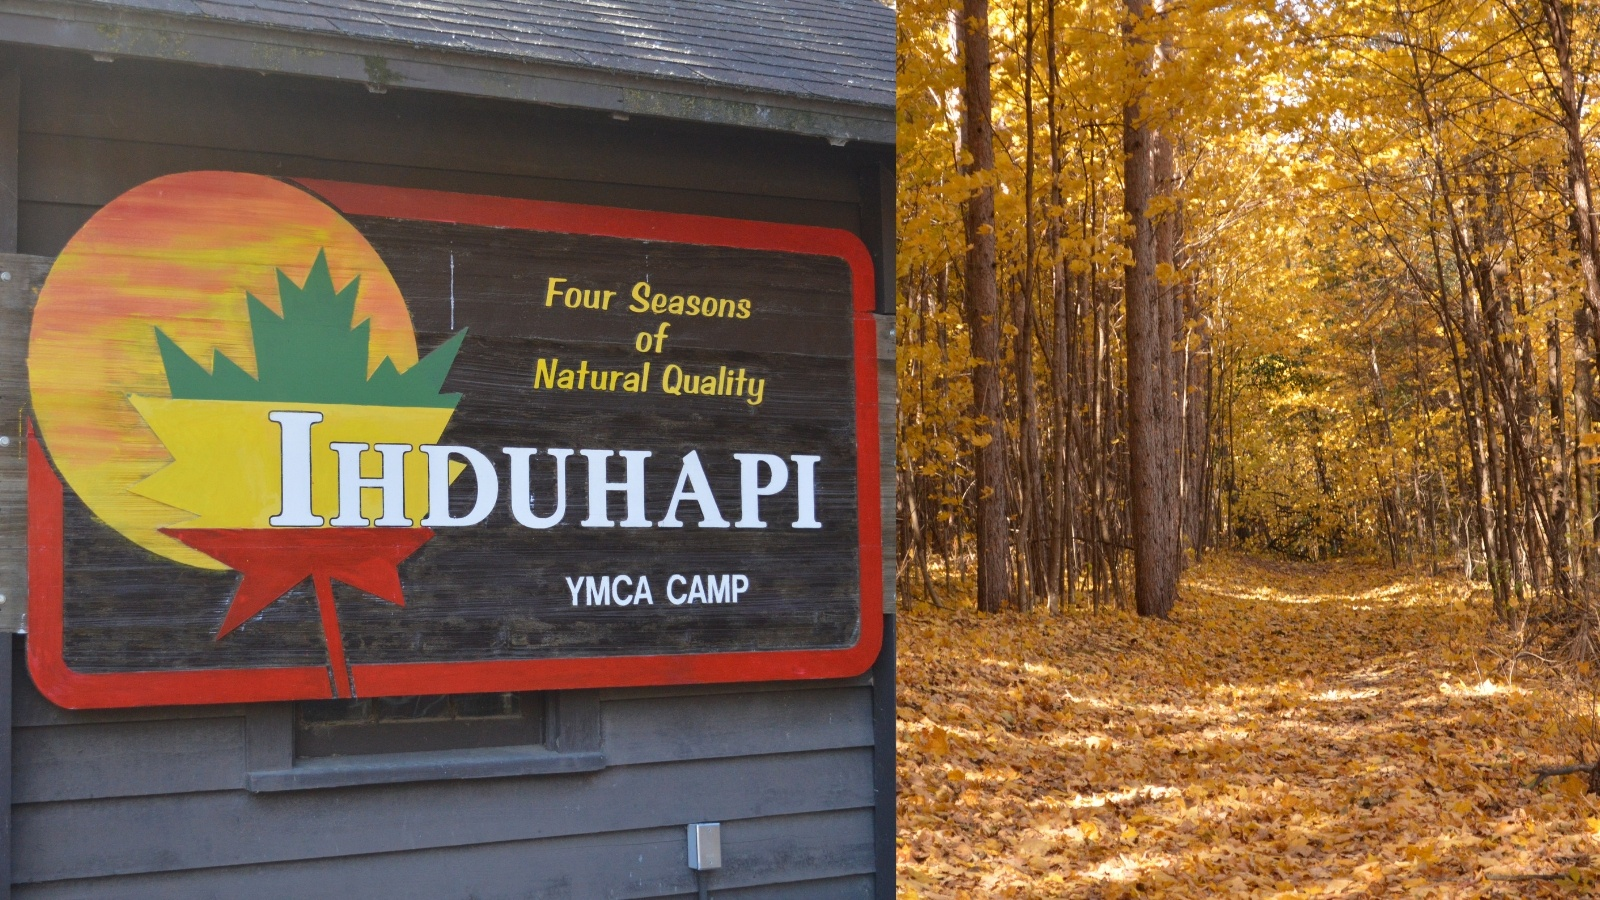 Camp Ihduhapi